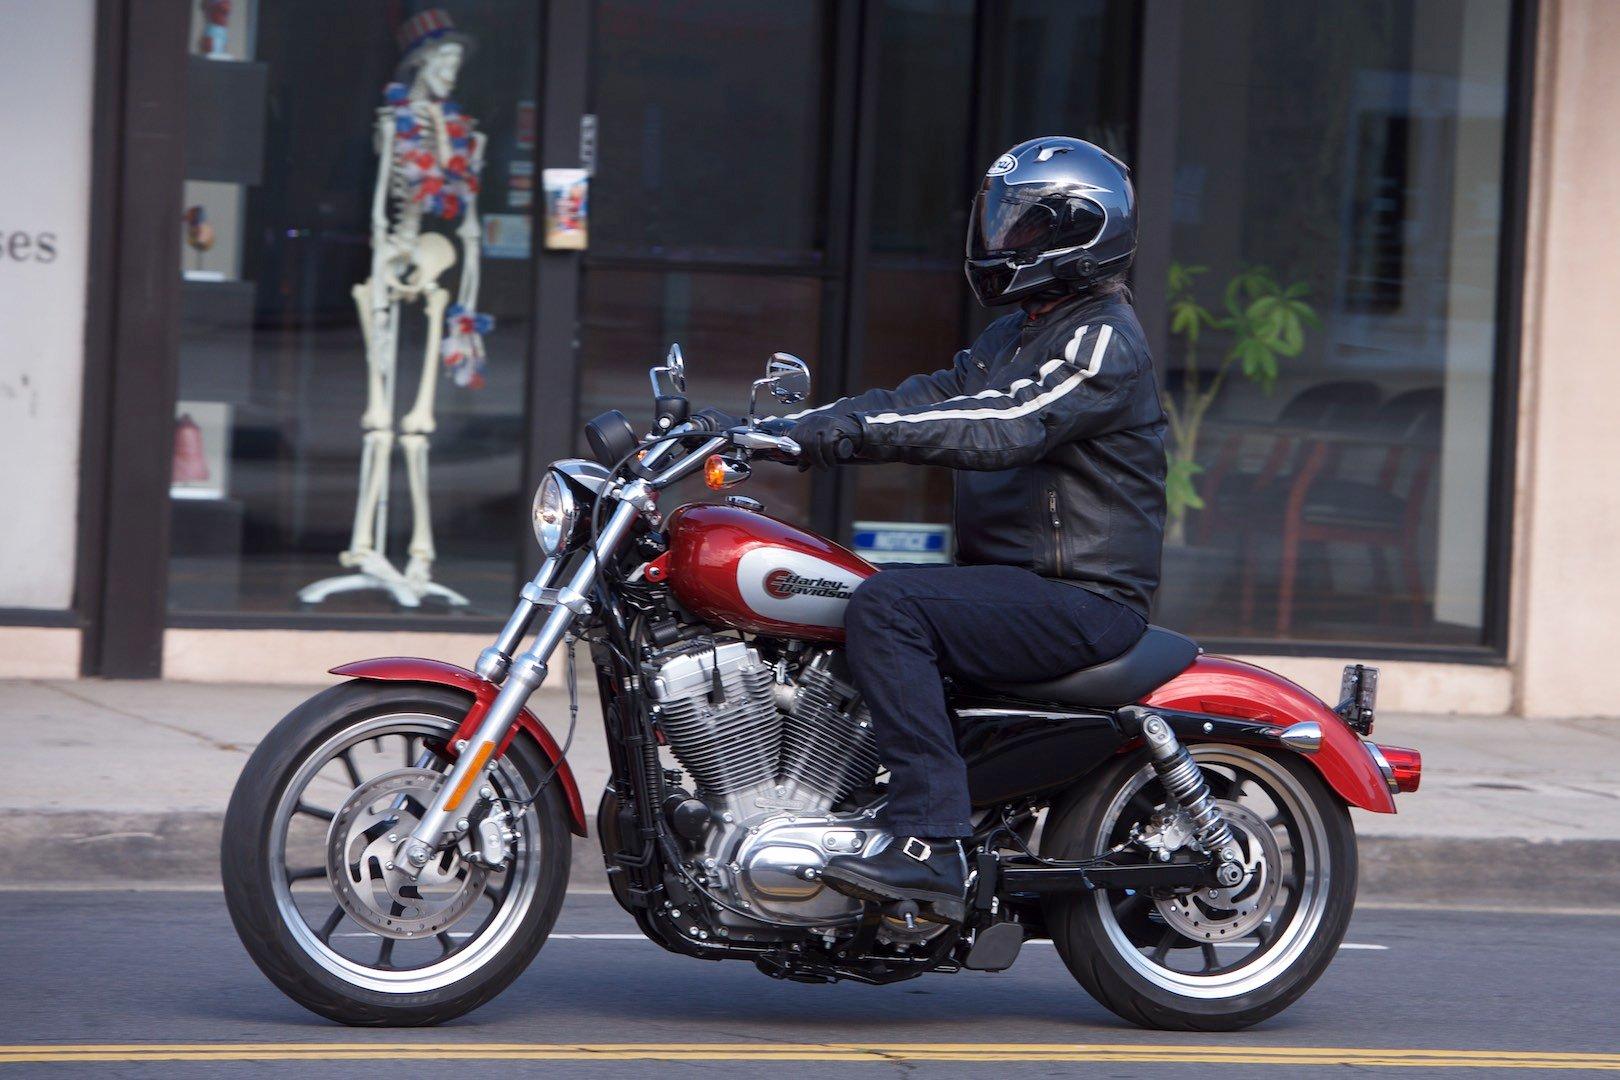 2019 Harley-Davidson Sportster Superlow review